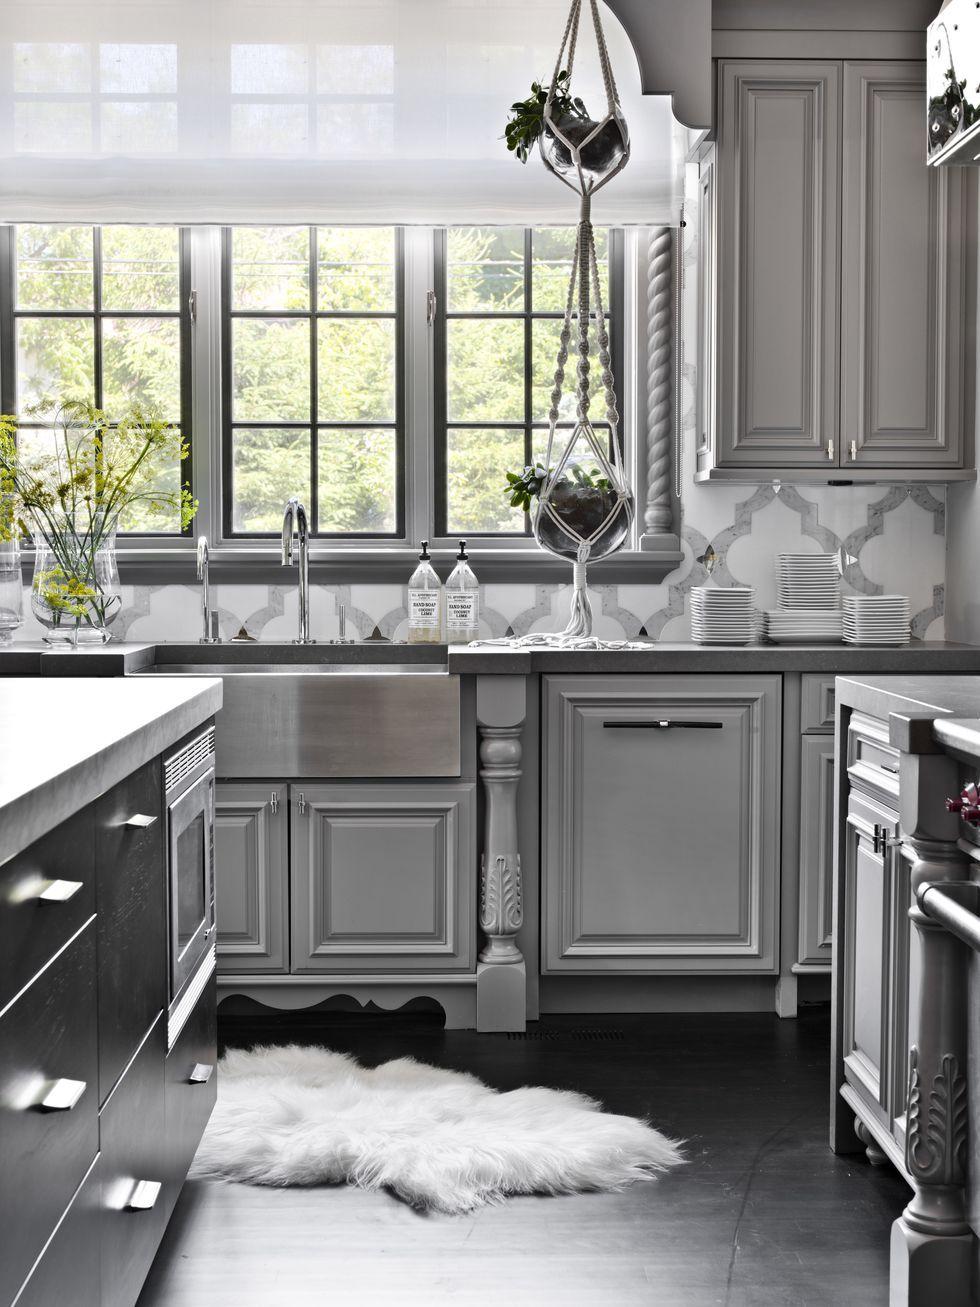 20 gorgeous kitchen tile backsplashes best kitchen tile ideas rh elledecor com kitchen tile design images kitchen wall tiles design ideas